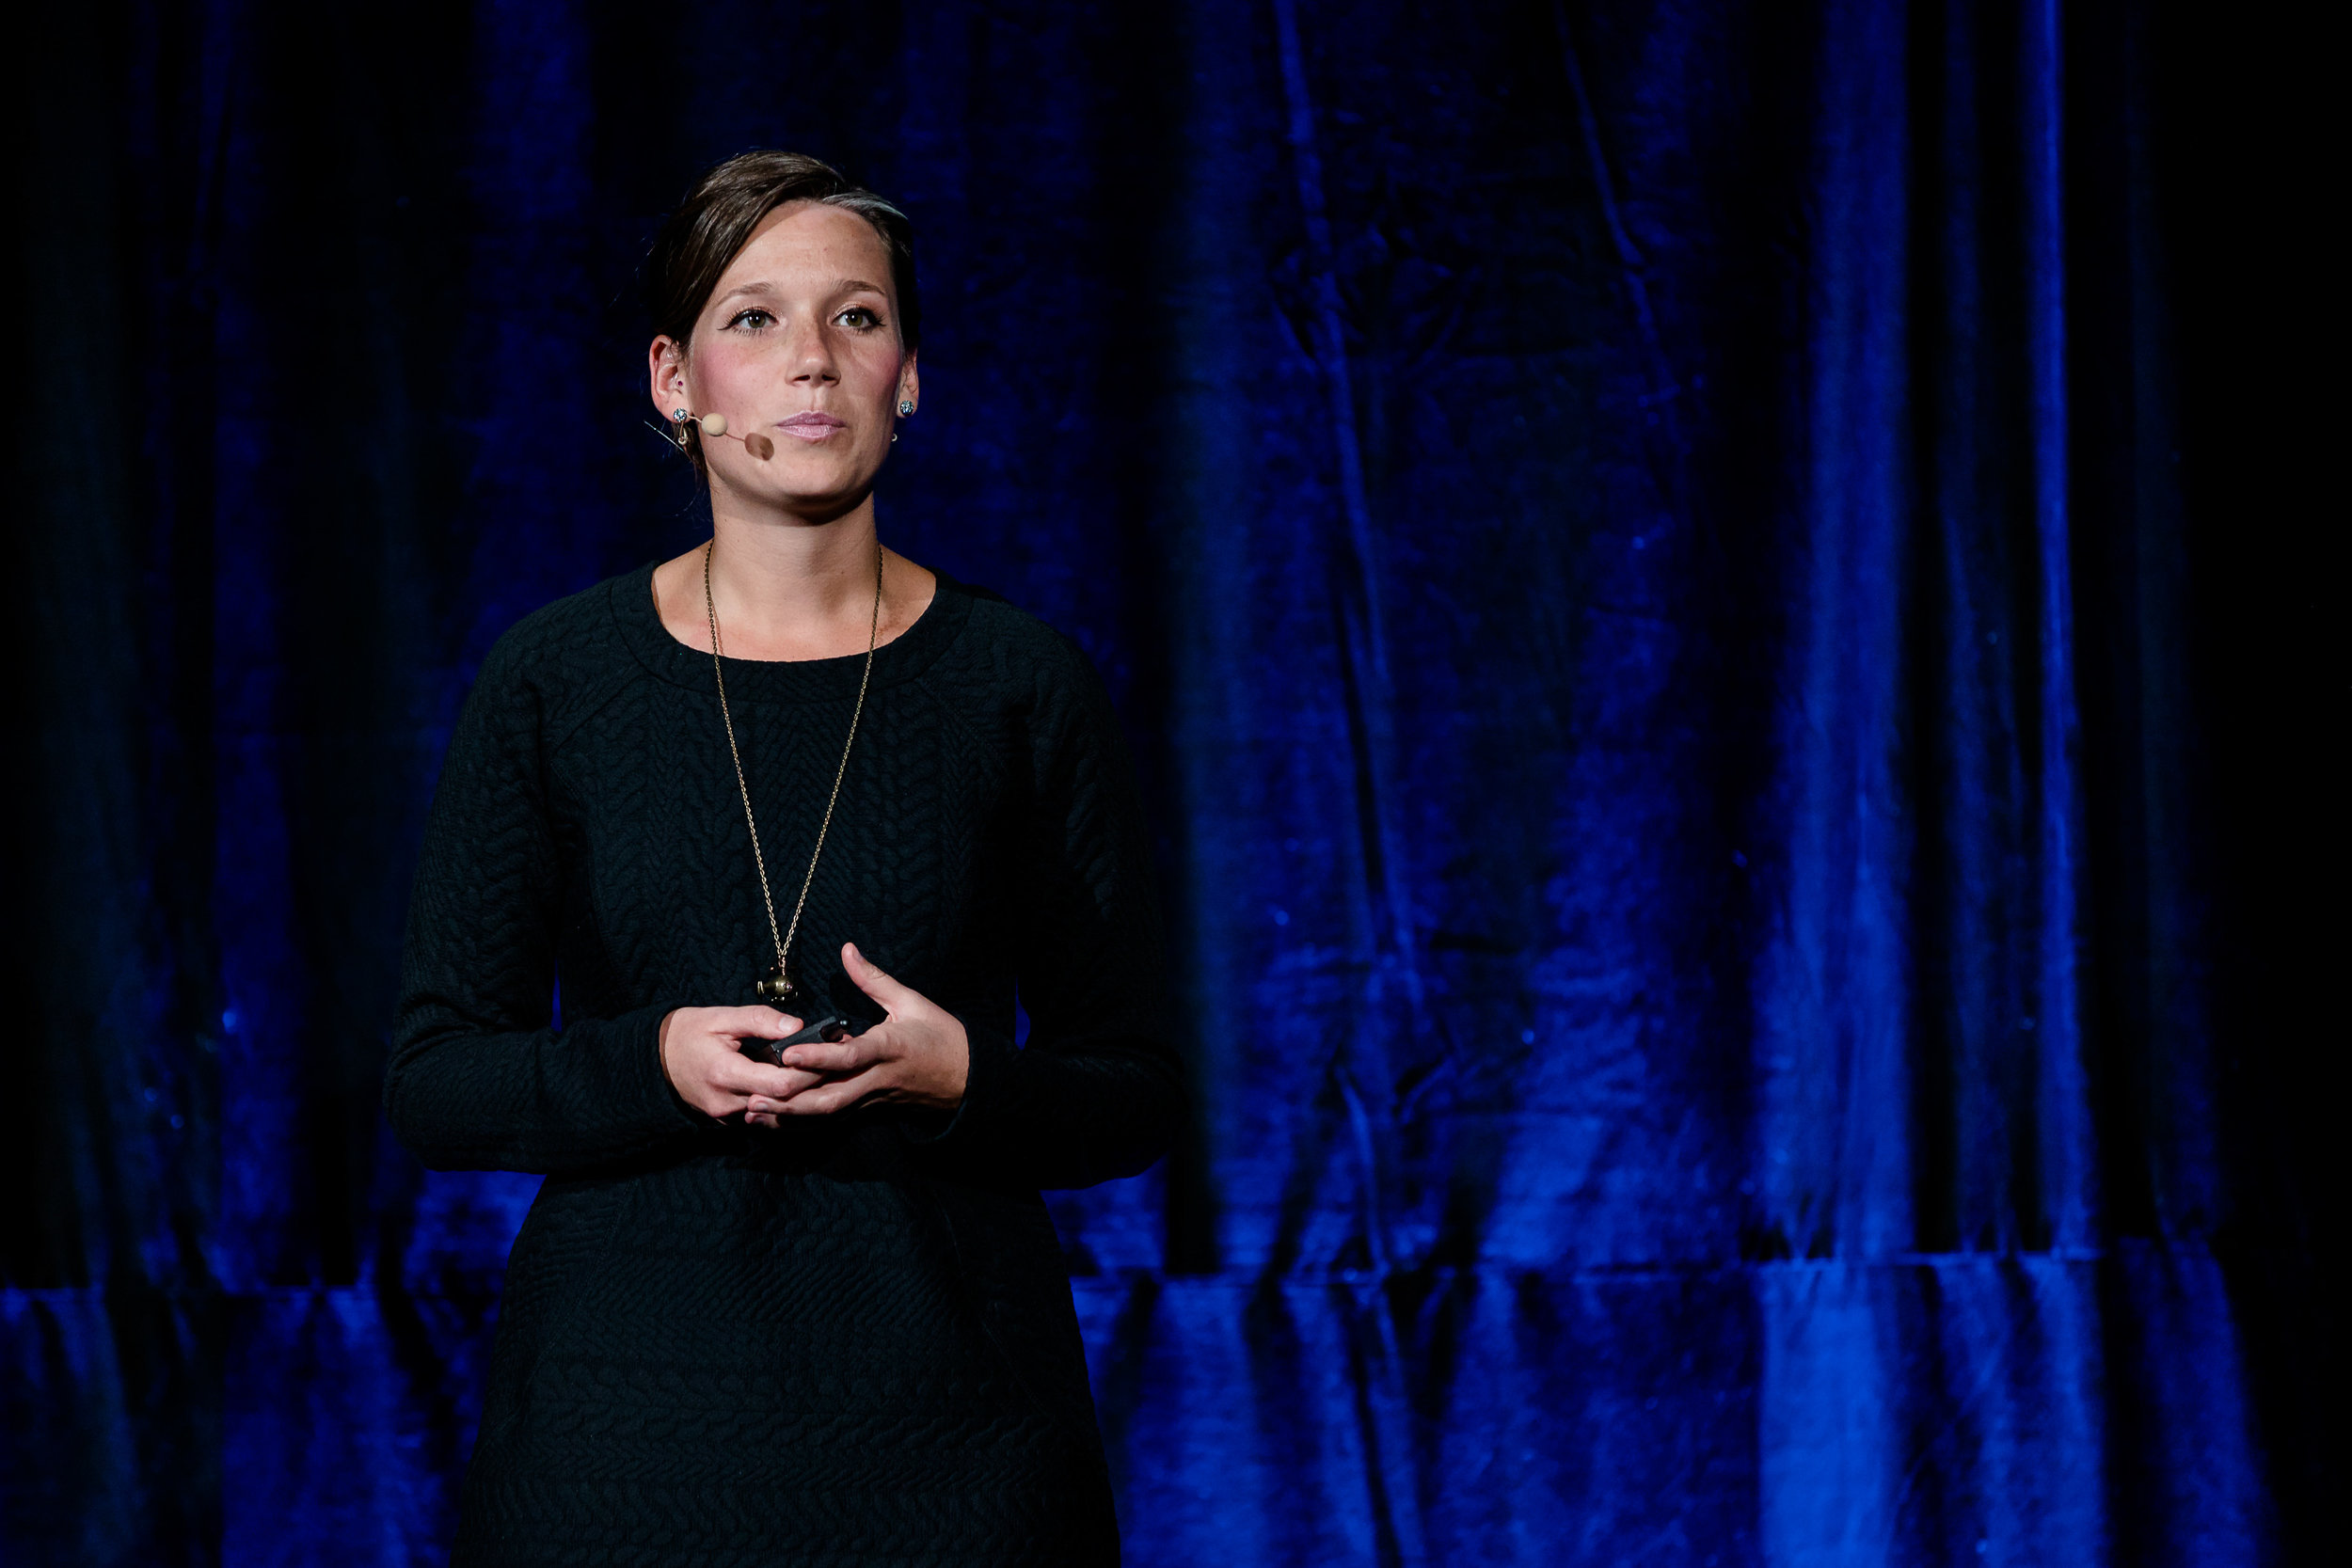 Natalie Panek, Rocket Scienctist, MDA Robotics